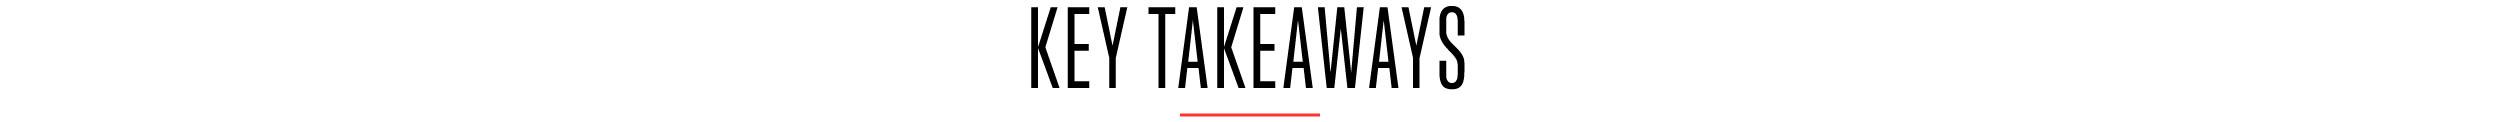 Blog-Key-Takeaways.jpg